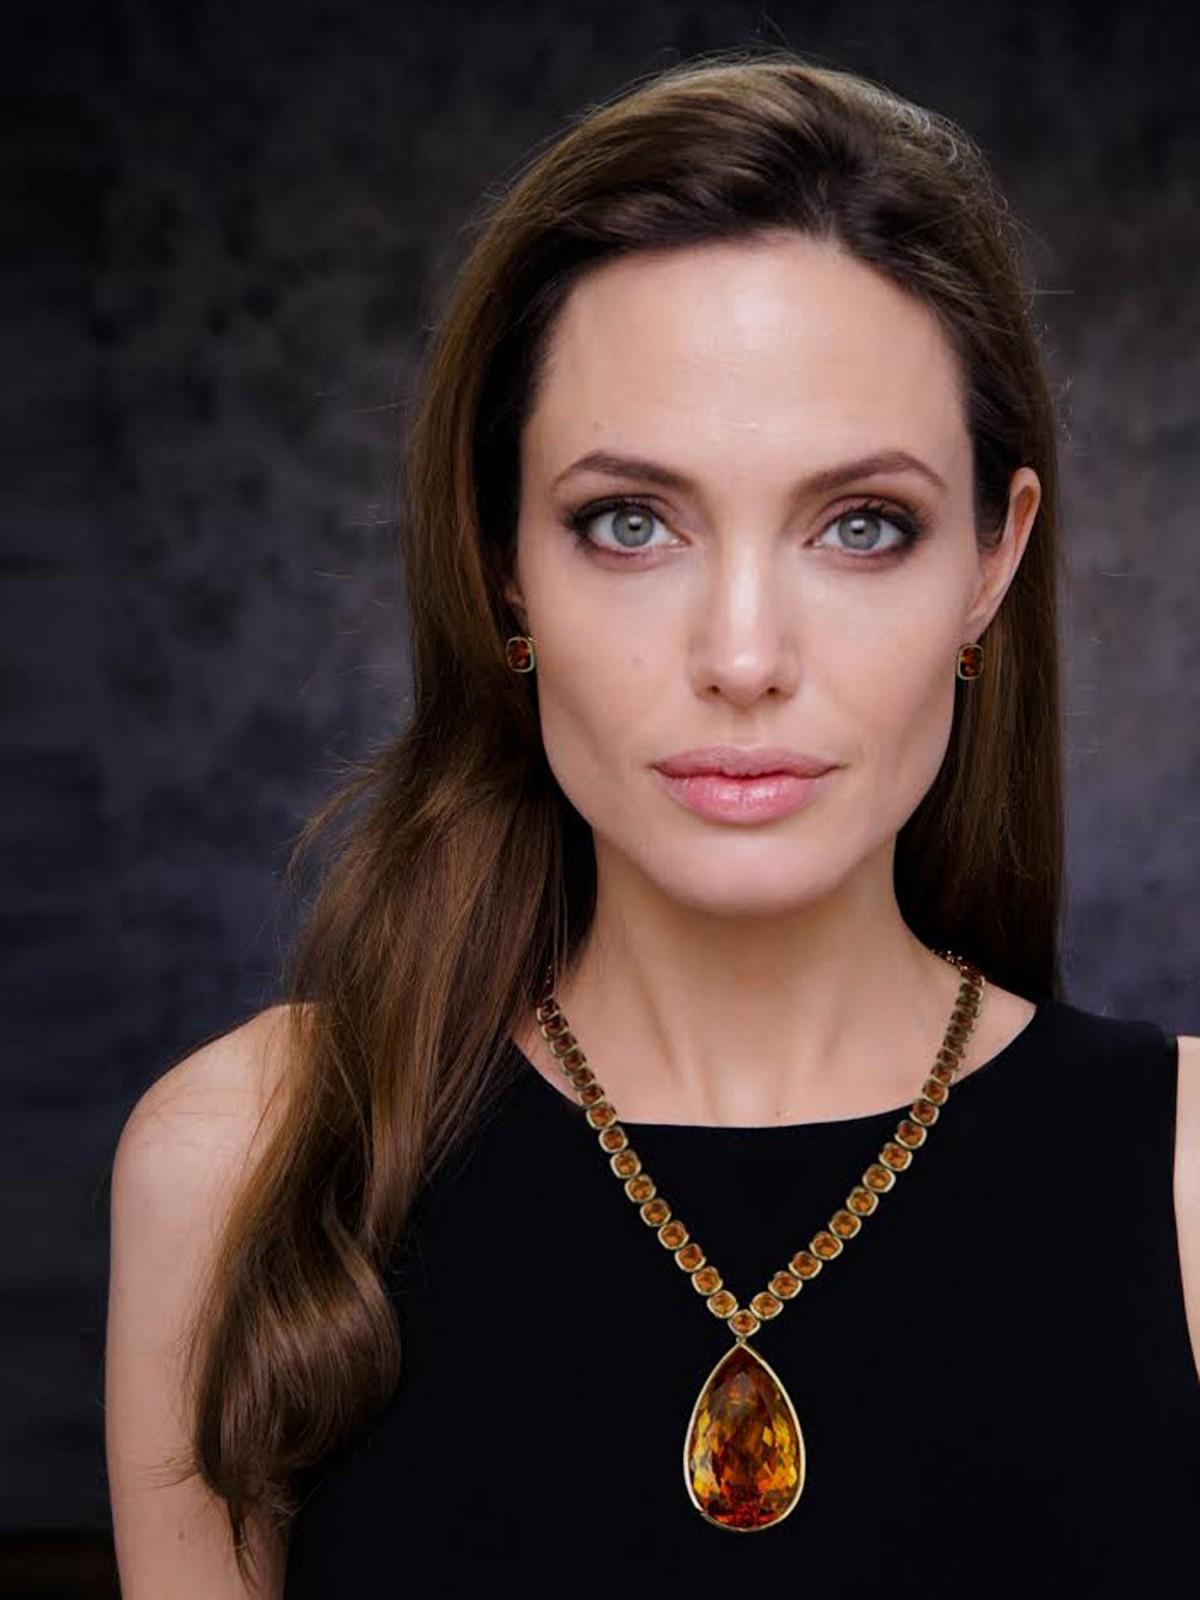 Angelina jolie ver foto chica desnuda gratis 18